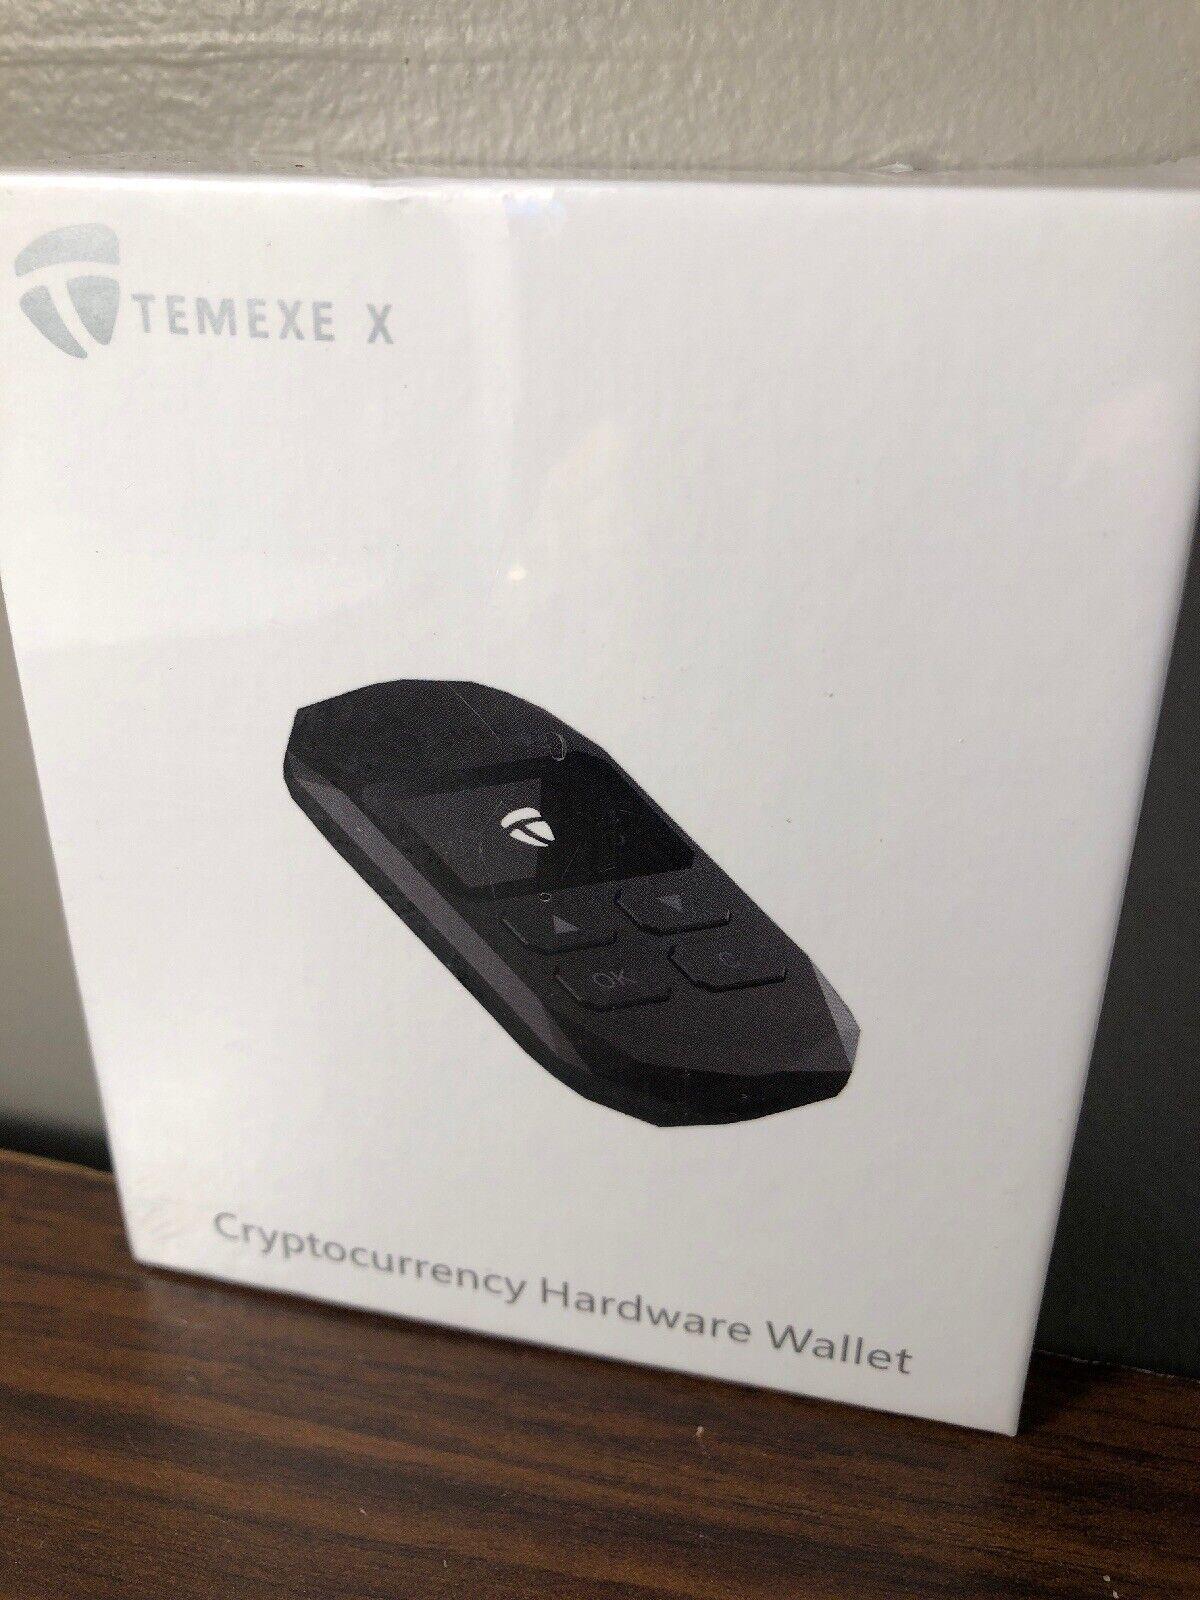 NEW Temexe X Cryptocurrency Hardware Wallet Bitcoin Ethereum ERC20 BTC ETH 1